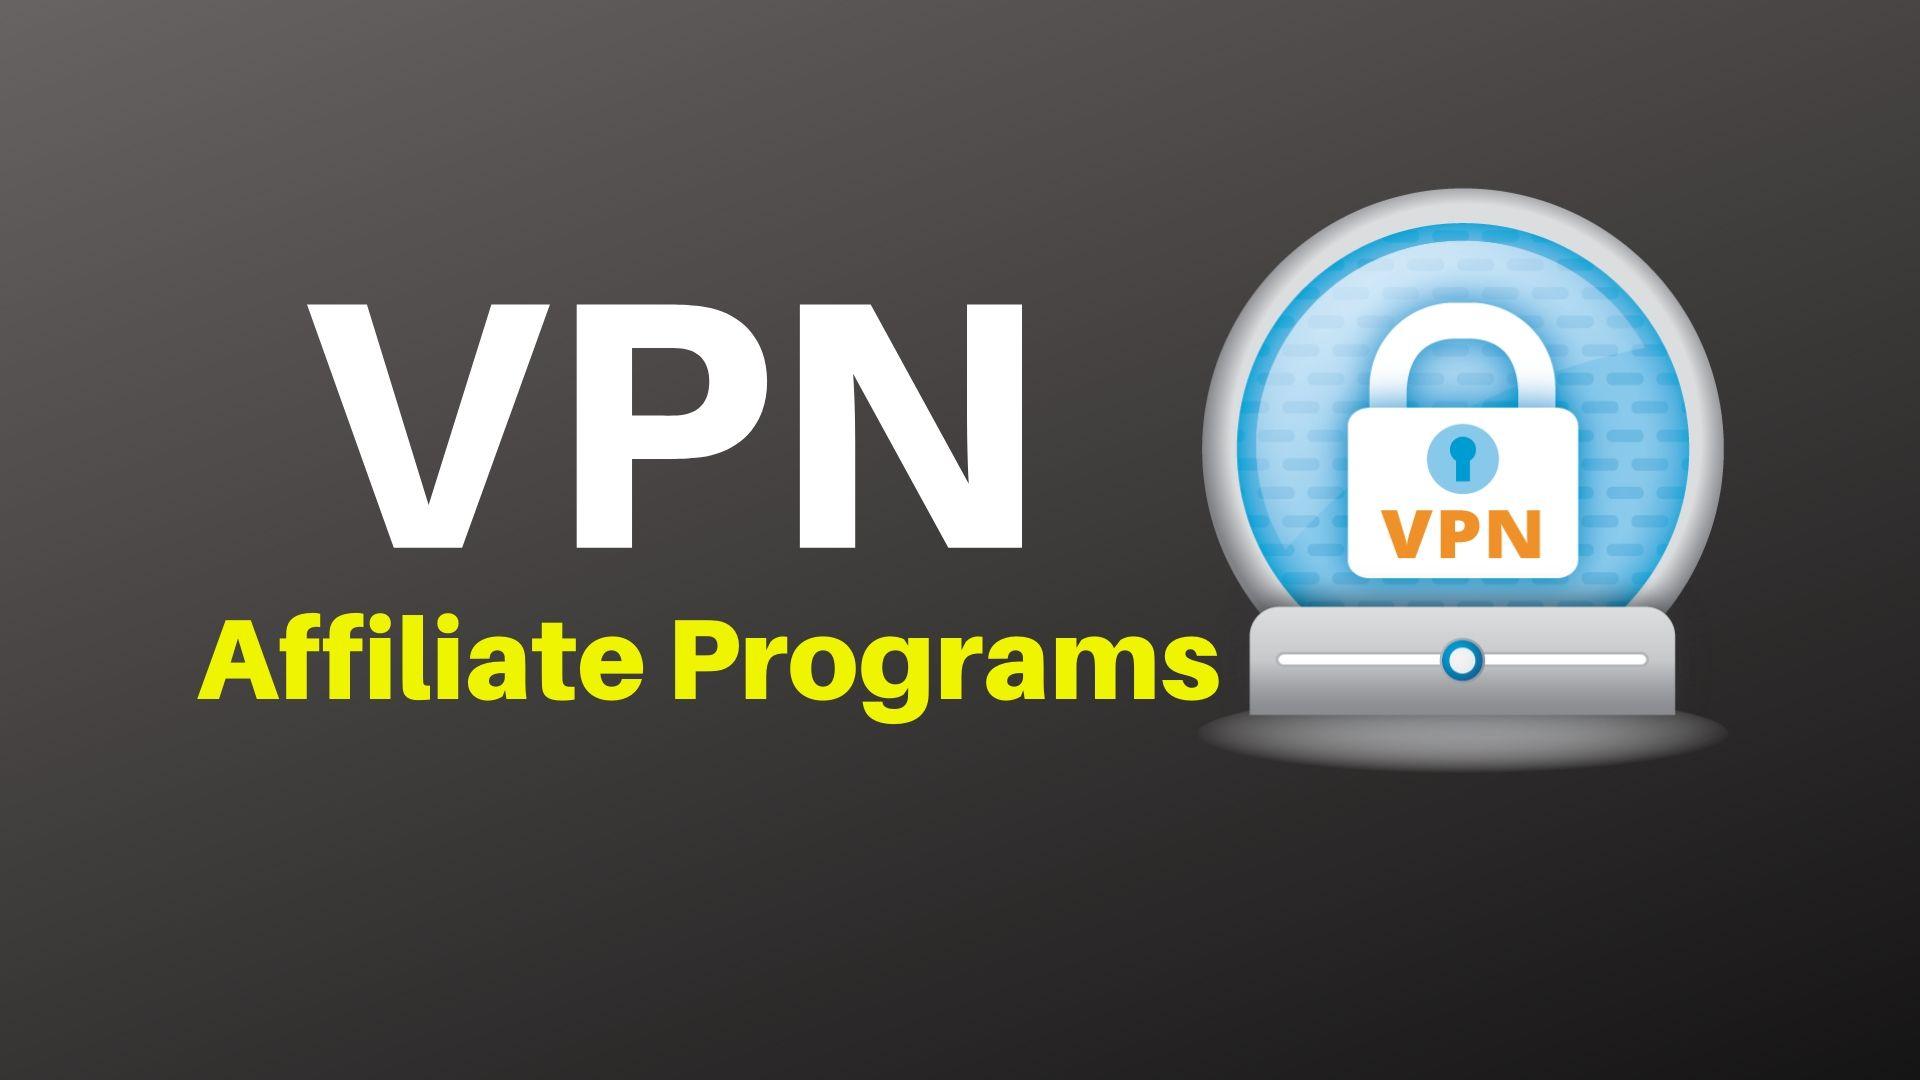 Best Affiliate Programs 2020.20 Best Vpn Affiliate Programs For 2020 High Paying